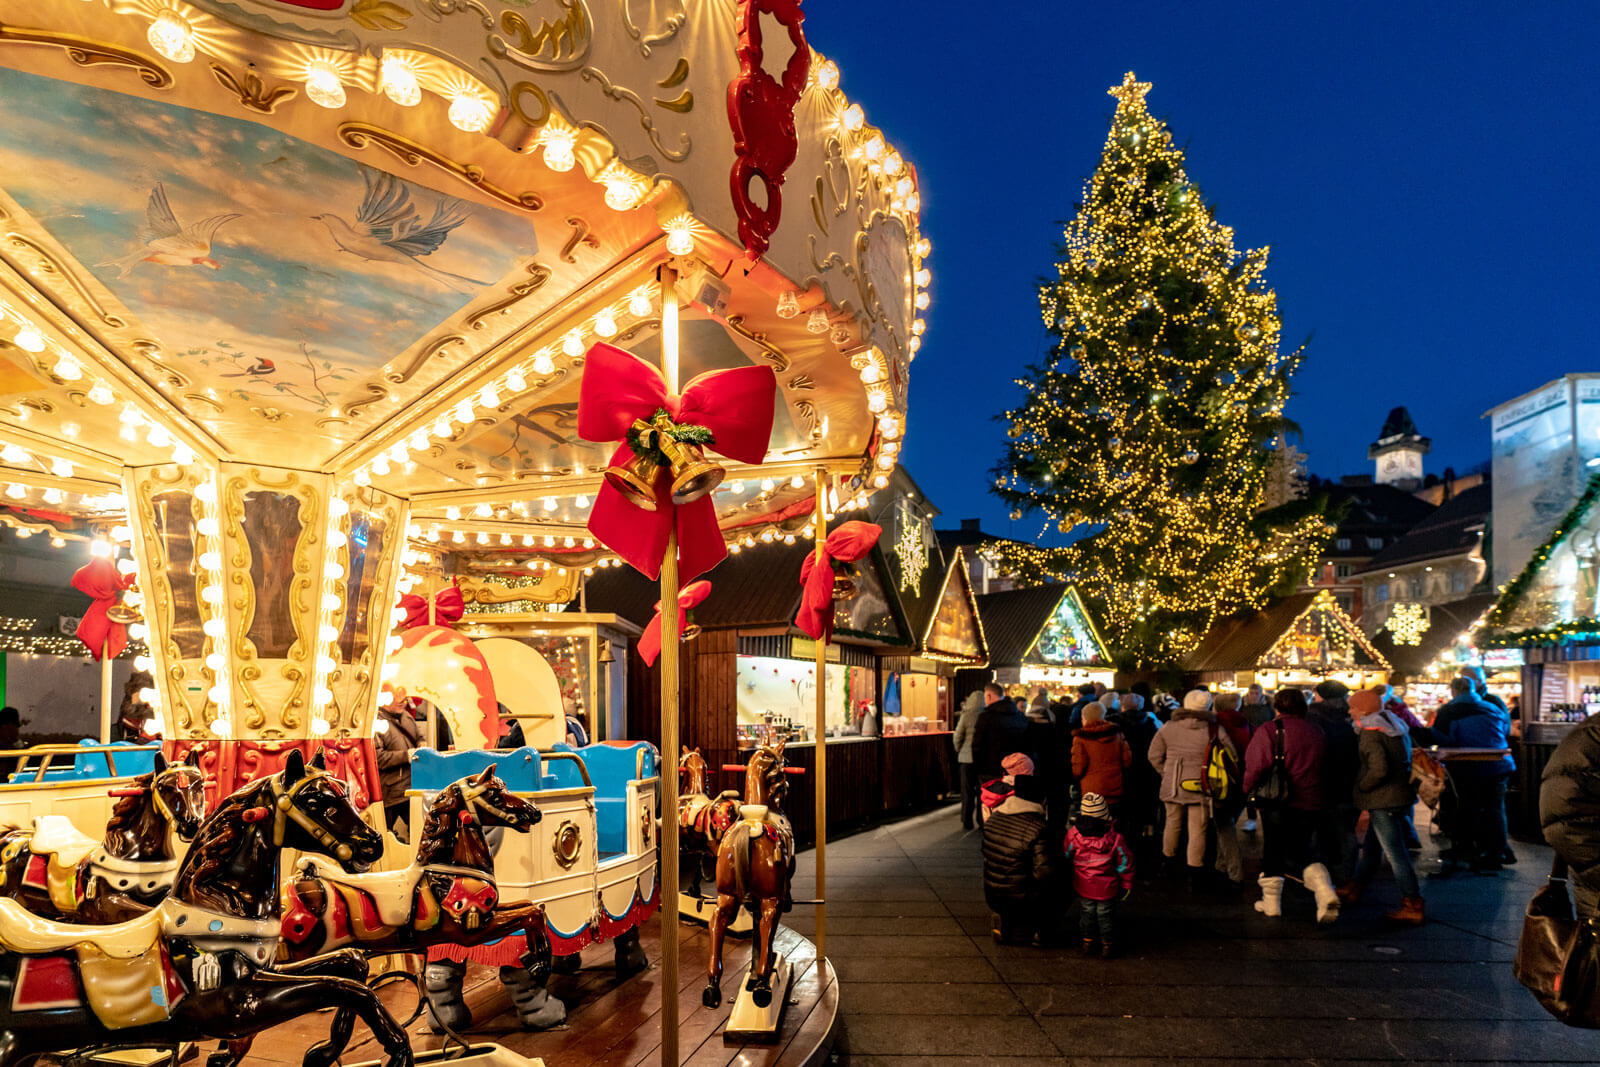 2021/01/Advent-Graz-Mariazell-6.jpg